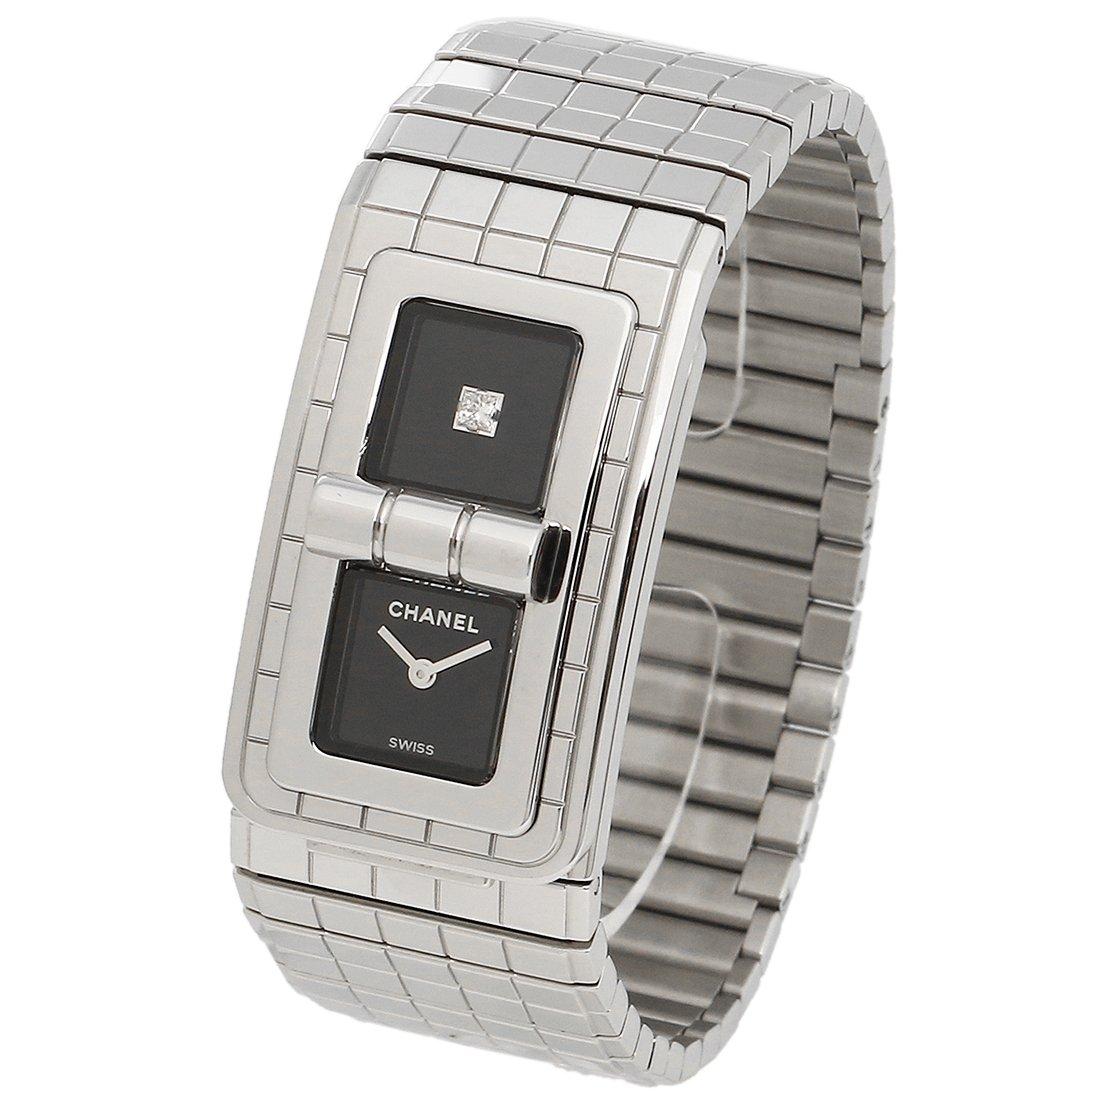 3e2a243a133a Amazon | [シャネル] 腕時計 レディース CHANEL H5144 シルバー ブラック [並行輸入品] | 並行輸入品・逆輸入品・中古品( レディース) | 腕時計 通販